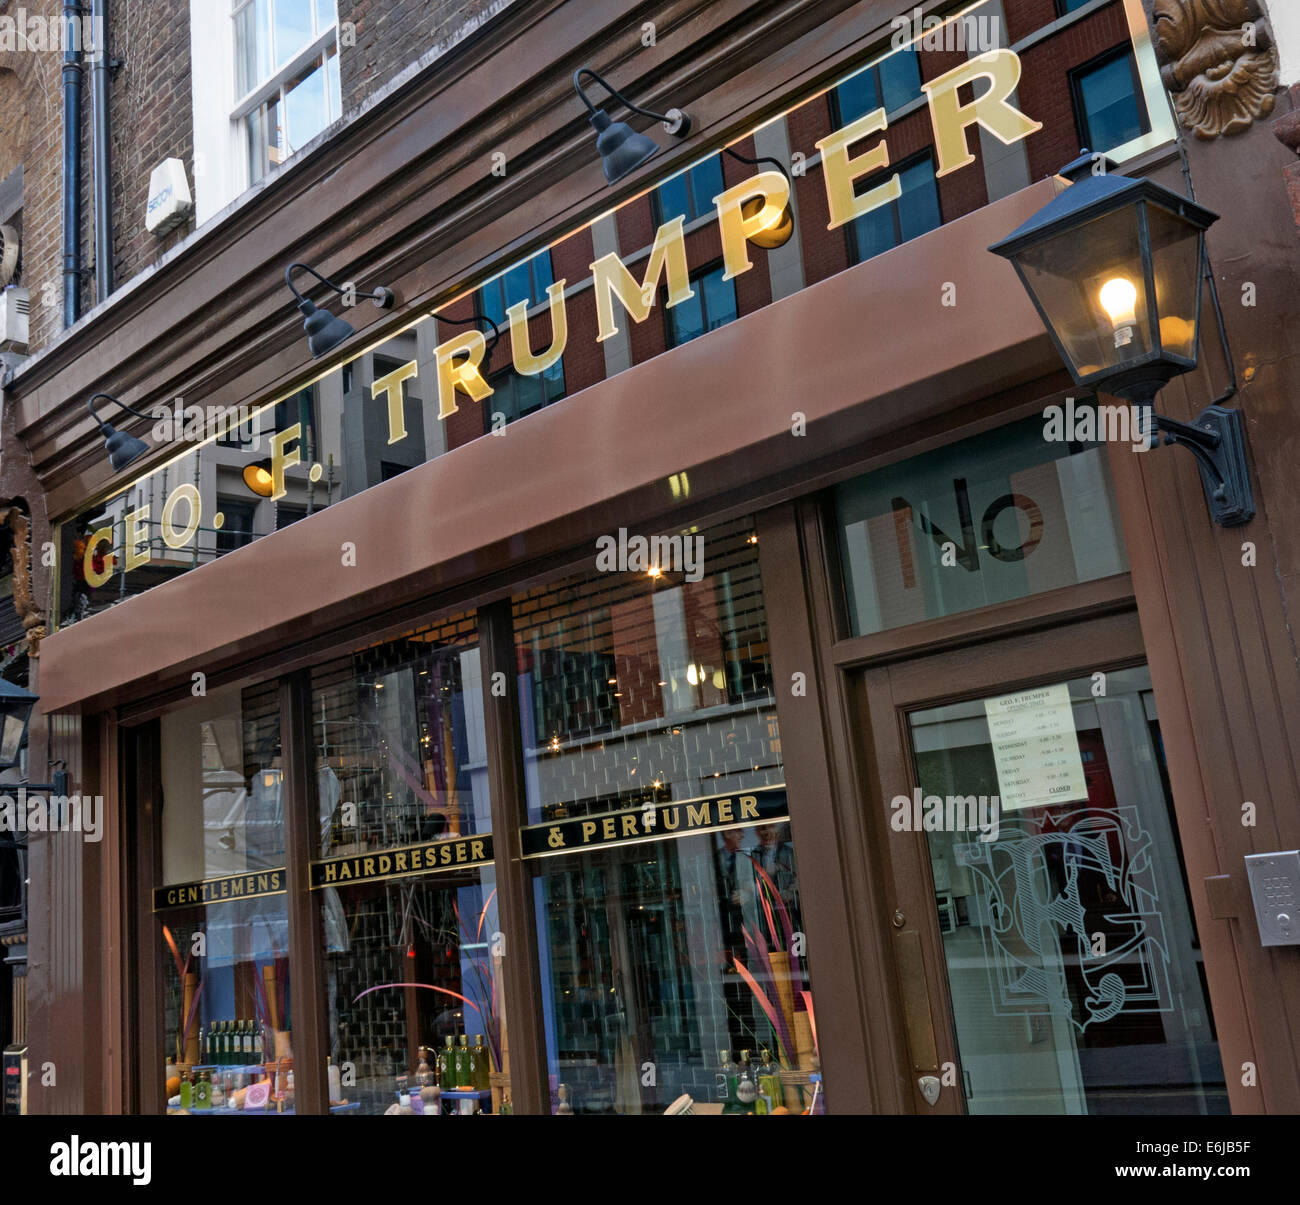 Geo. F. Trumper Gentleman's barbers and perfumers shop, Duke of York St, Mayfair, London, England UK Stock Photo